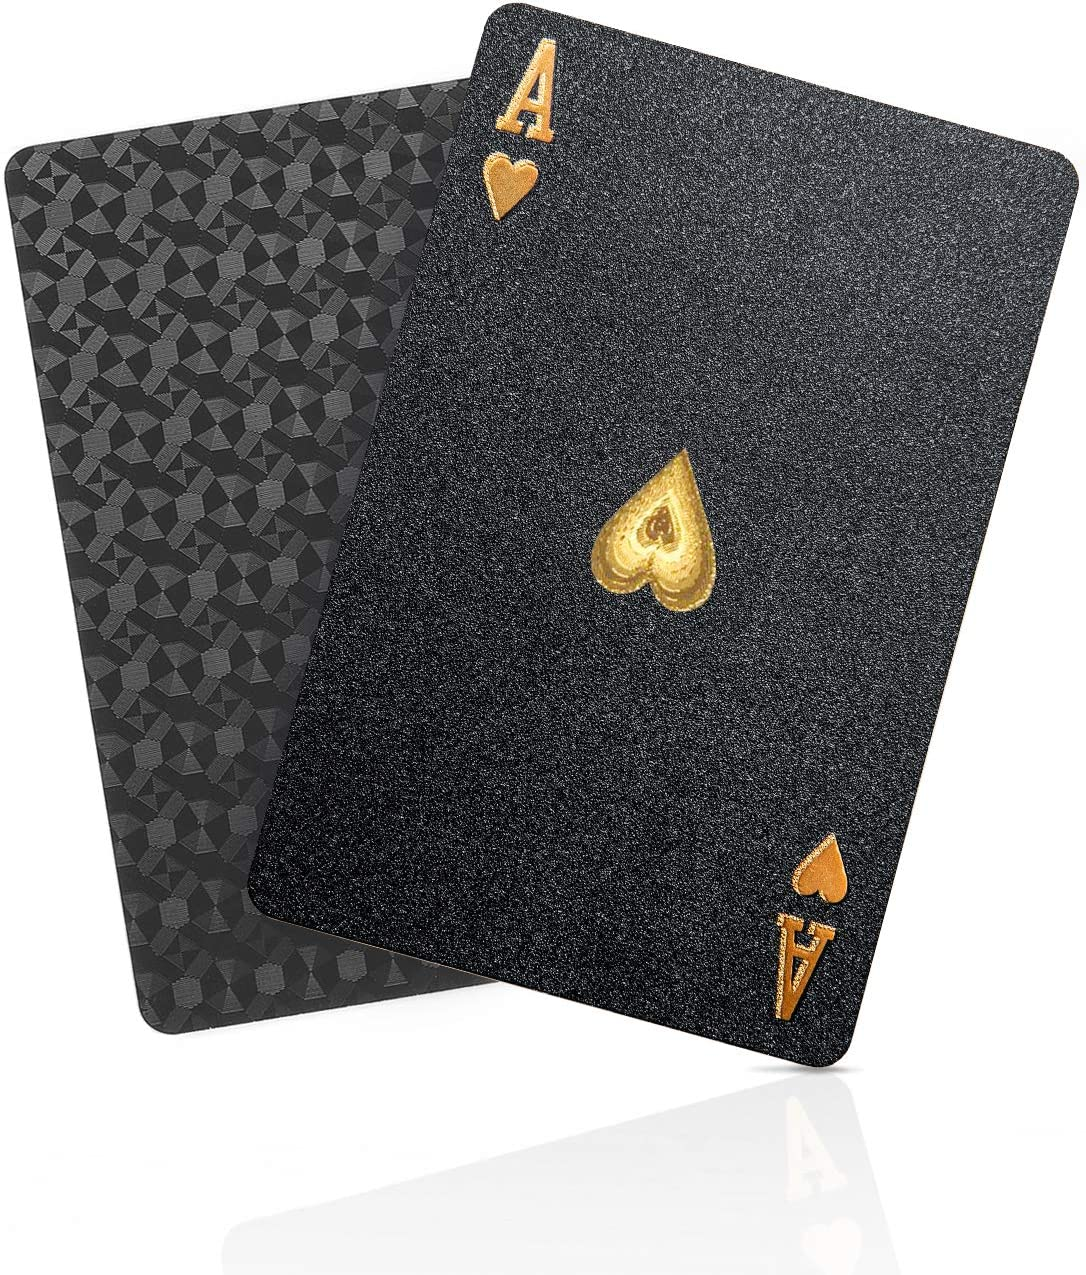 SolarMatrix Black Diamond Waterproof Playing Cards Novelty (HD,1 Deck of Cards, Poker Cards Deck)